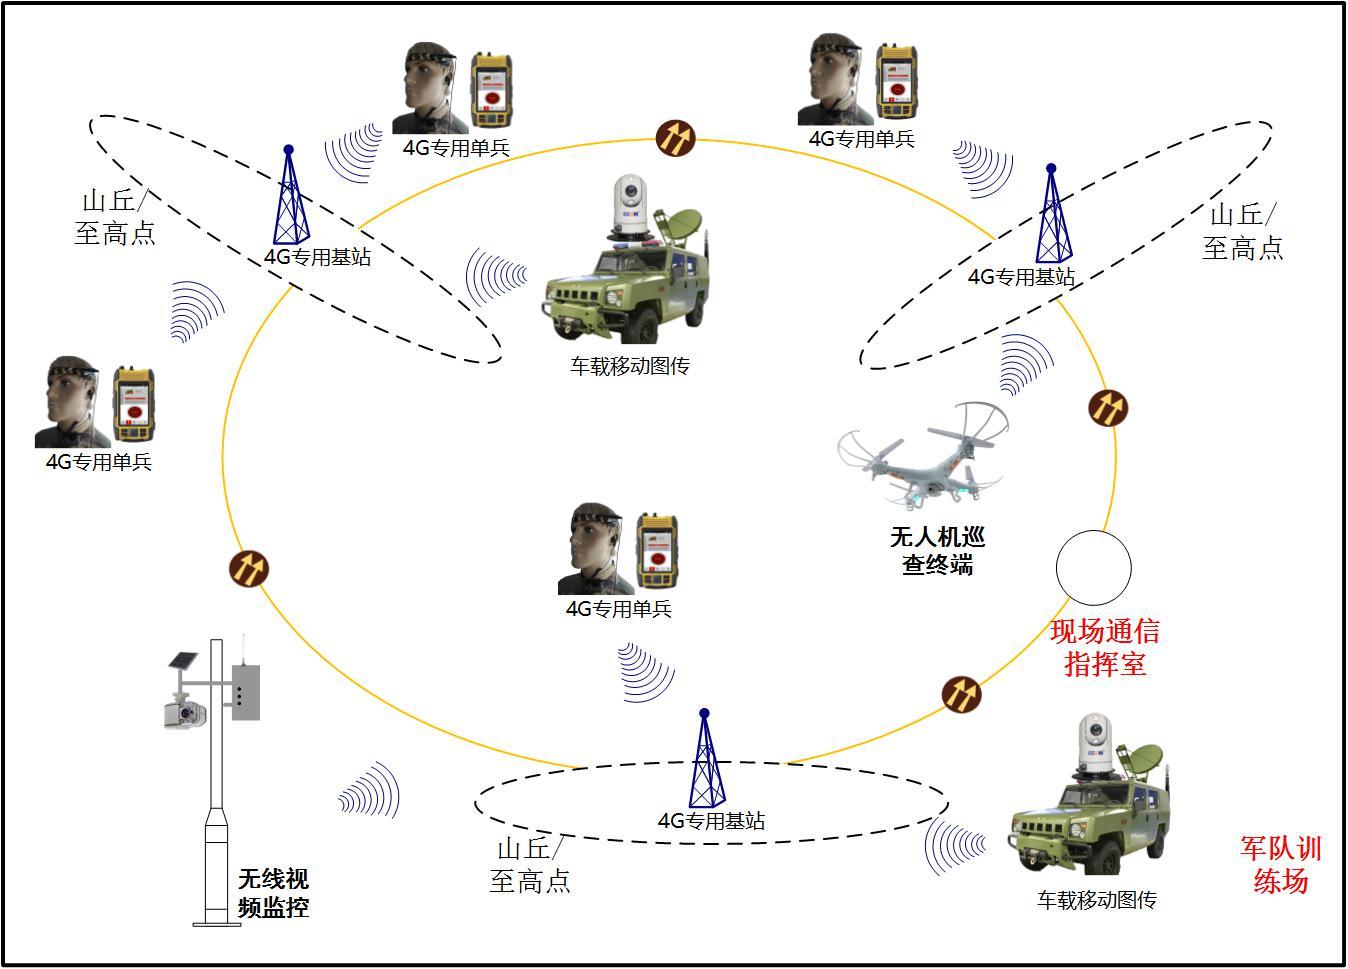 l 多业务综合承载:通过一张网络,可实现视频监控,语音对讲,集群调度,任务派发等多种业务统一承载 l 多角度立体应用:通过单兵、车载、无人机等多种类型的专用终端设备,可适用于不同作战兵种及武装设备 l 信息安全保密:使用4G专用网络通信,专有的认证和加密保障,保证信息的安全传递。